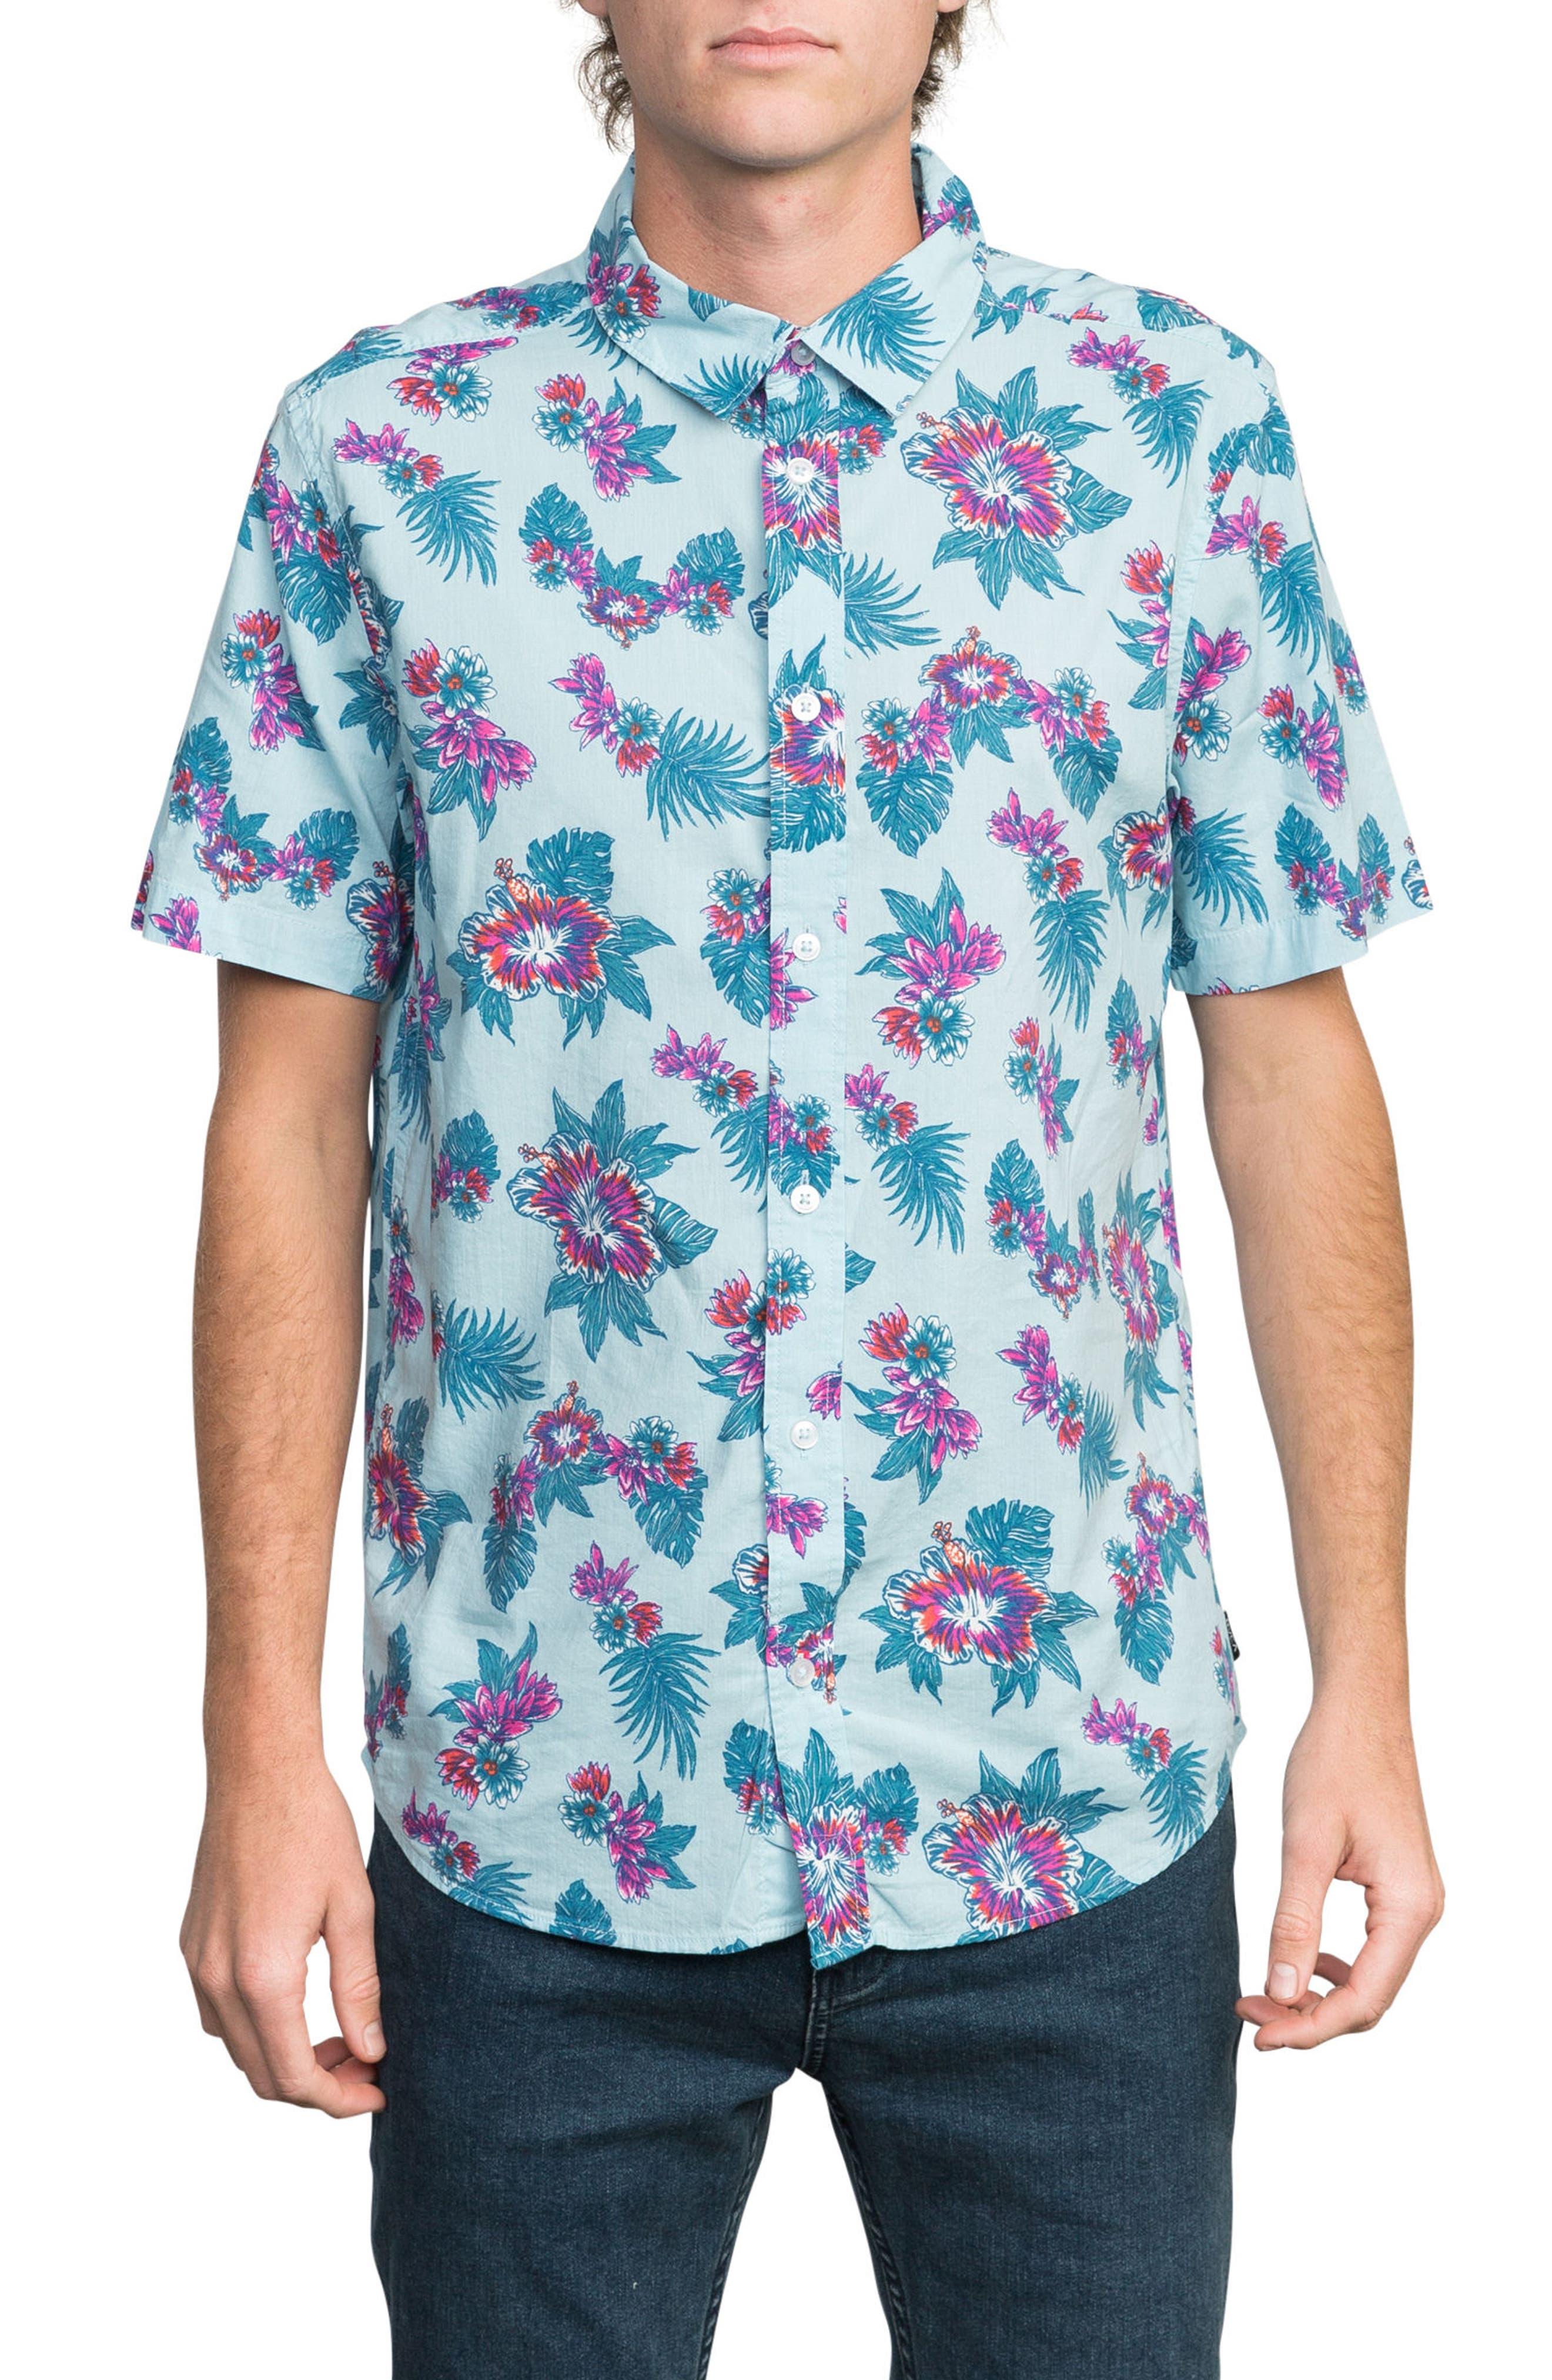 McMillan Floral Woven Shirt,                             Main thumbnail 1, color,                             Blue Floral